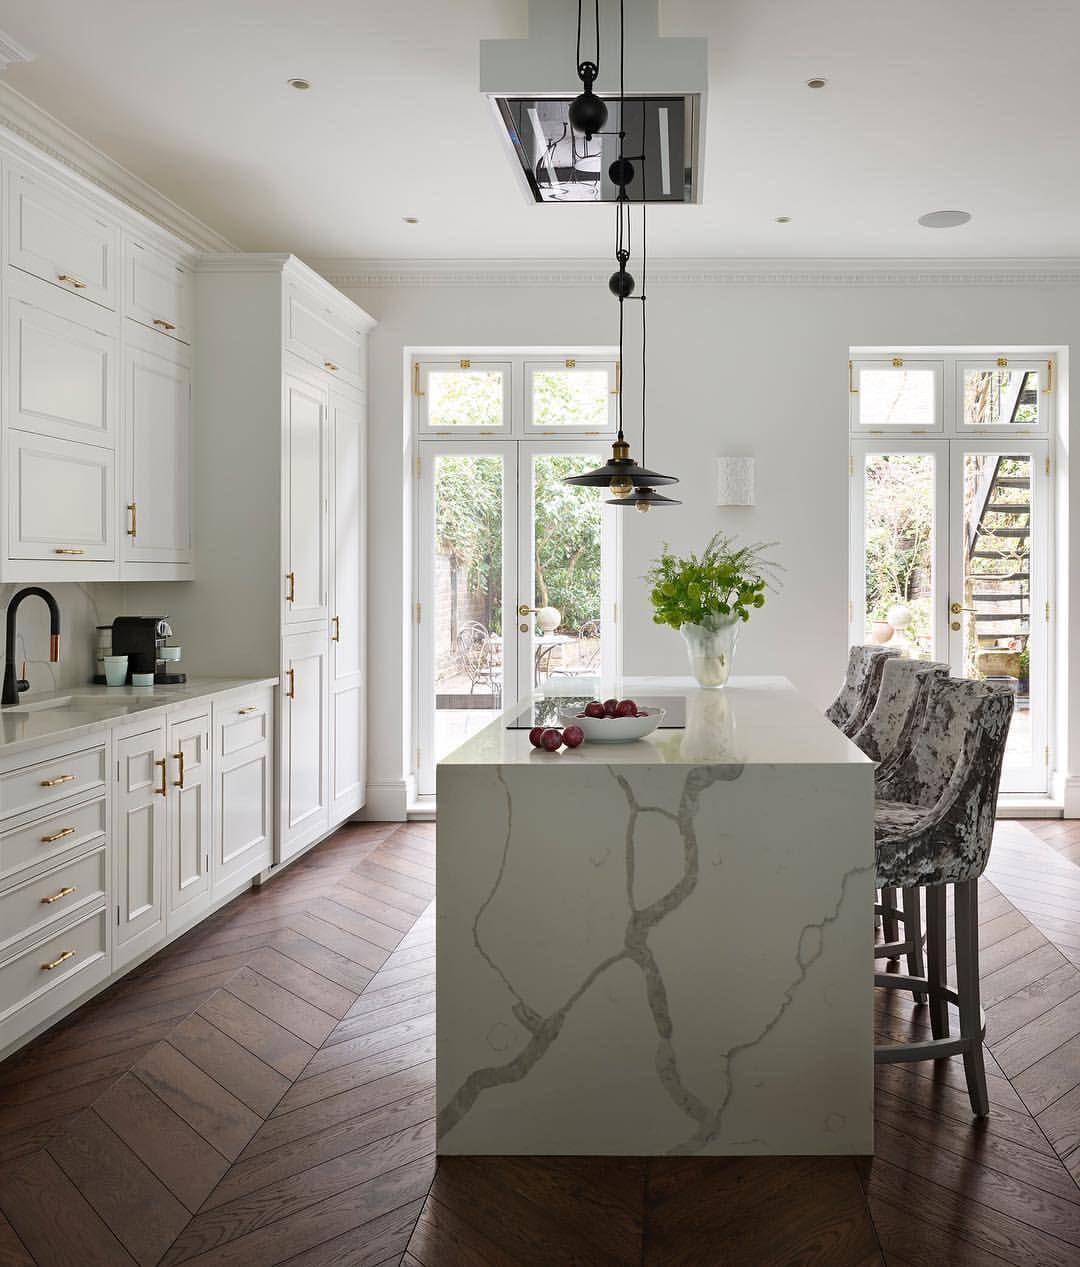 A fresh start to the week this white original kitchen design blends